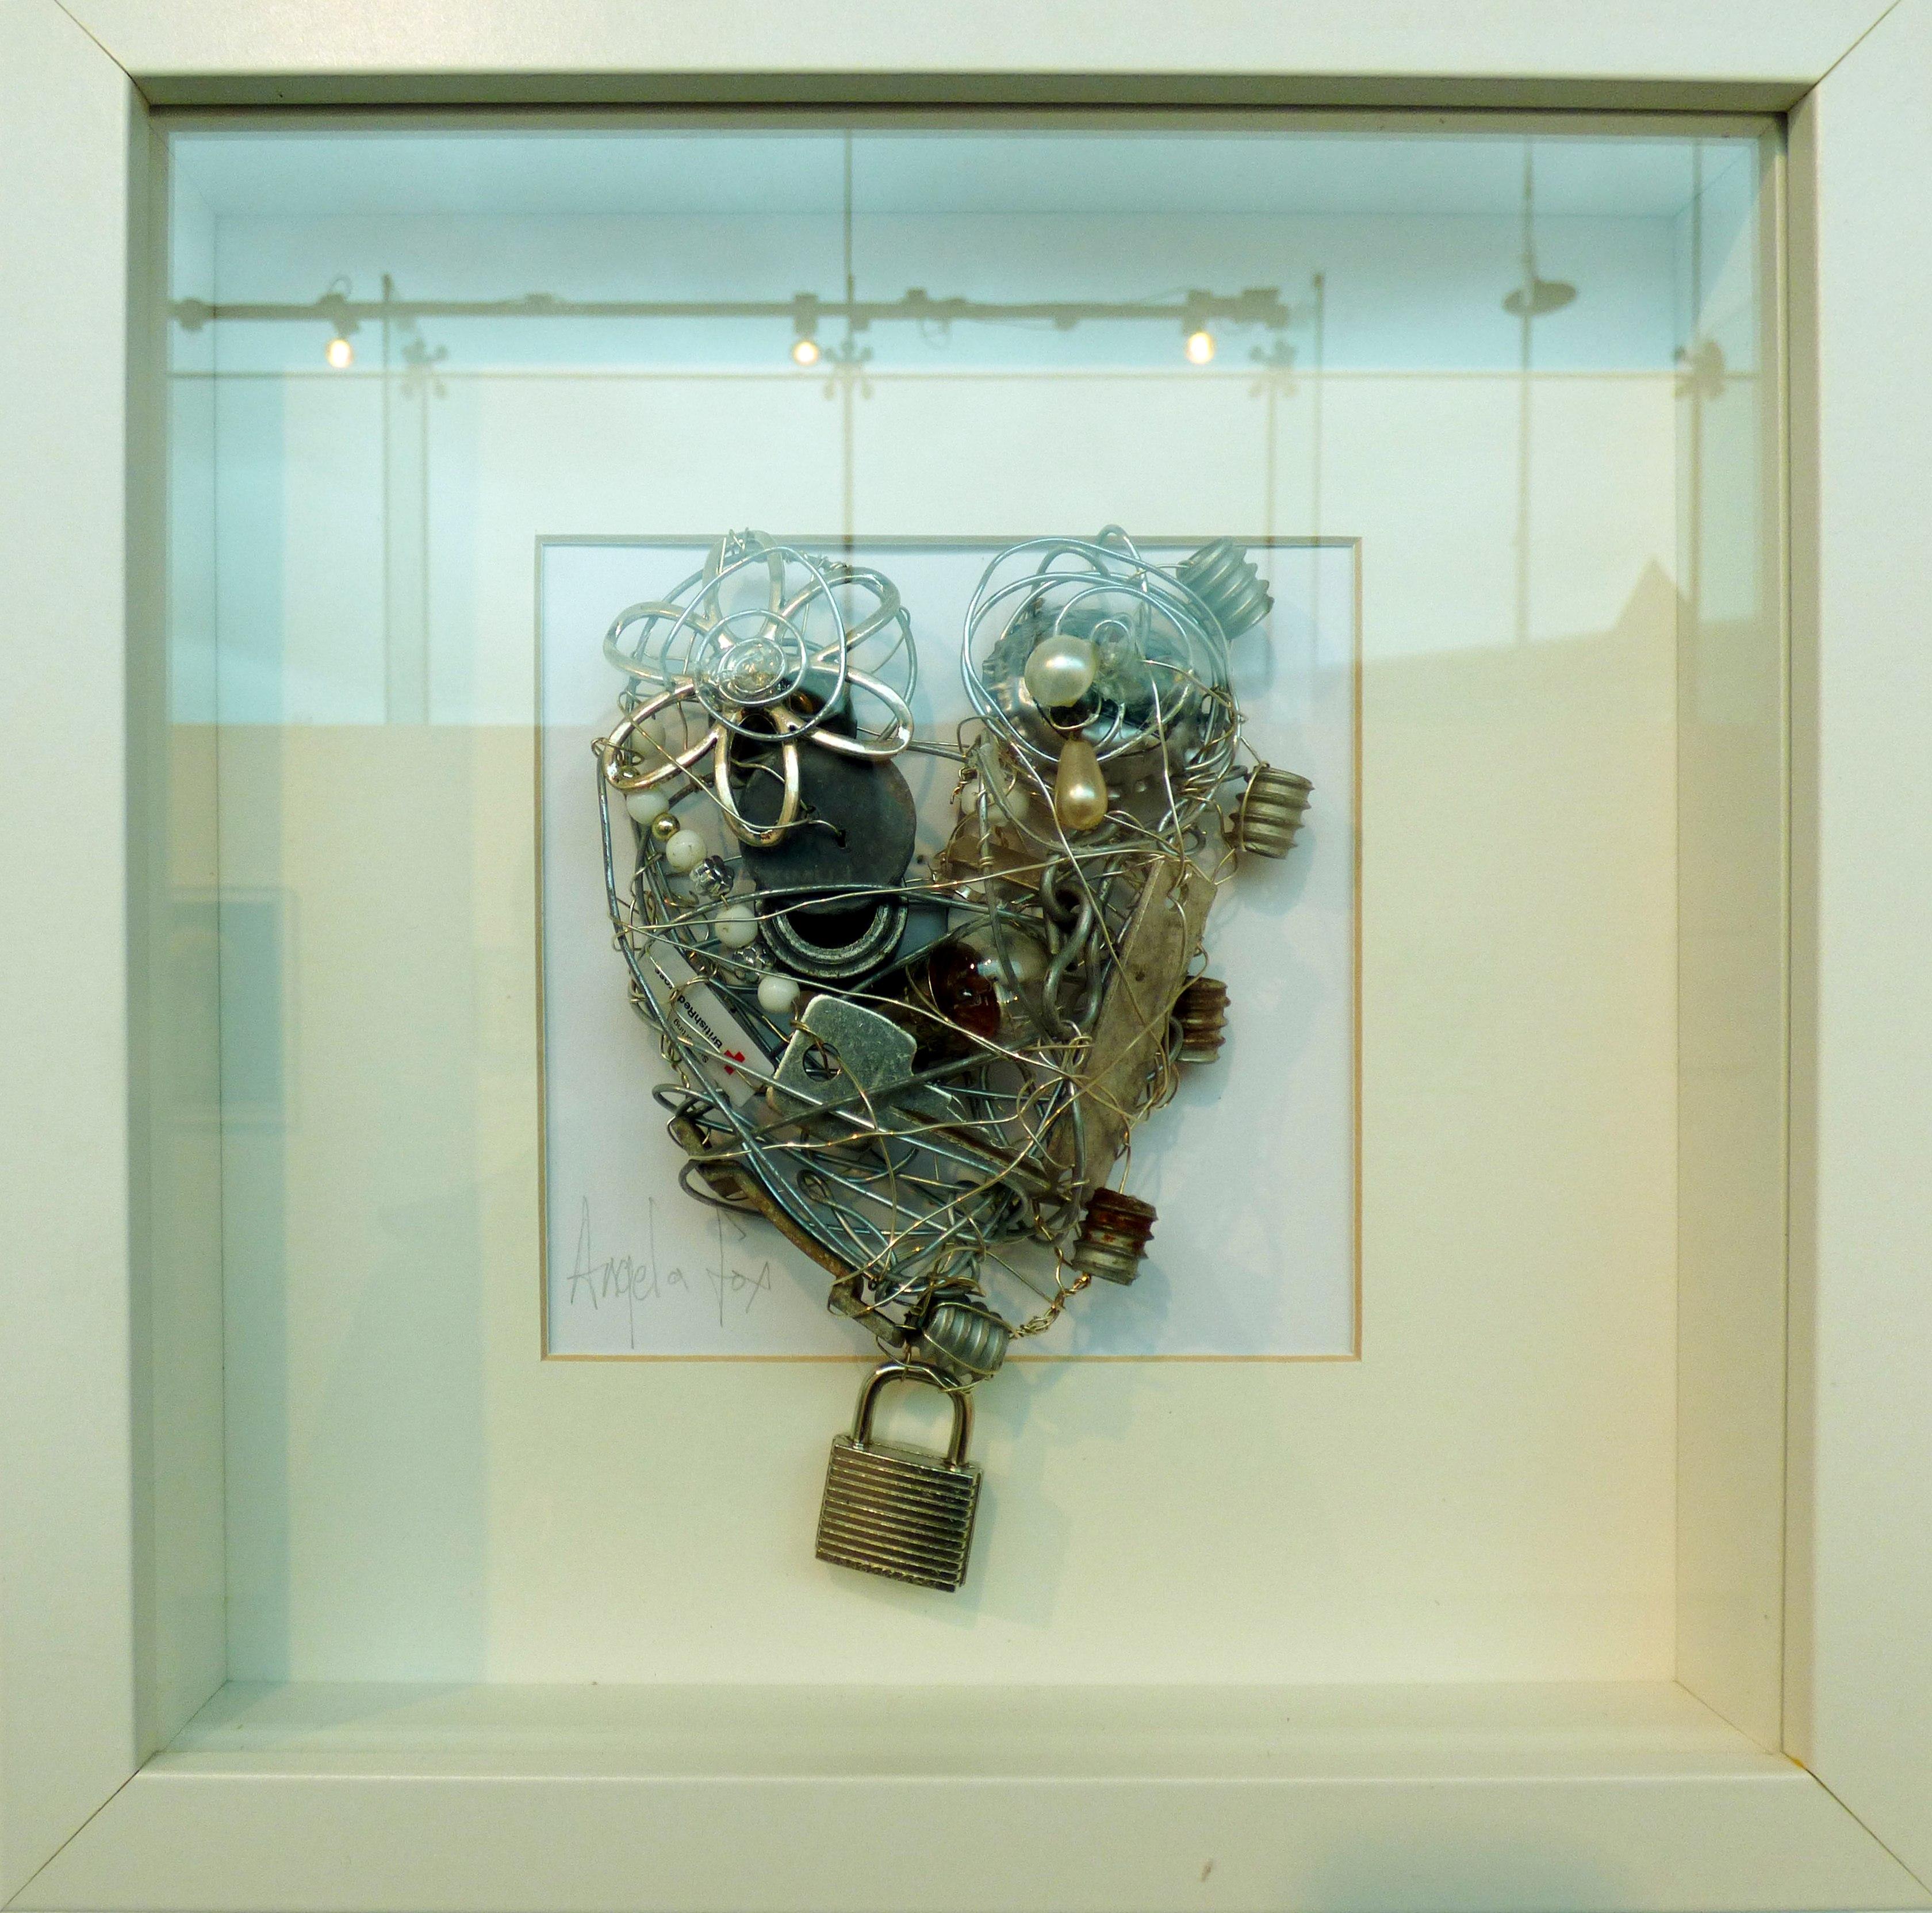 LOCKED by Angela Fox, mixed media. From The Heart exhibition, St Helens, Feb 2020